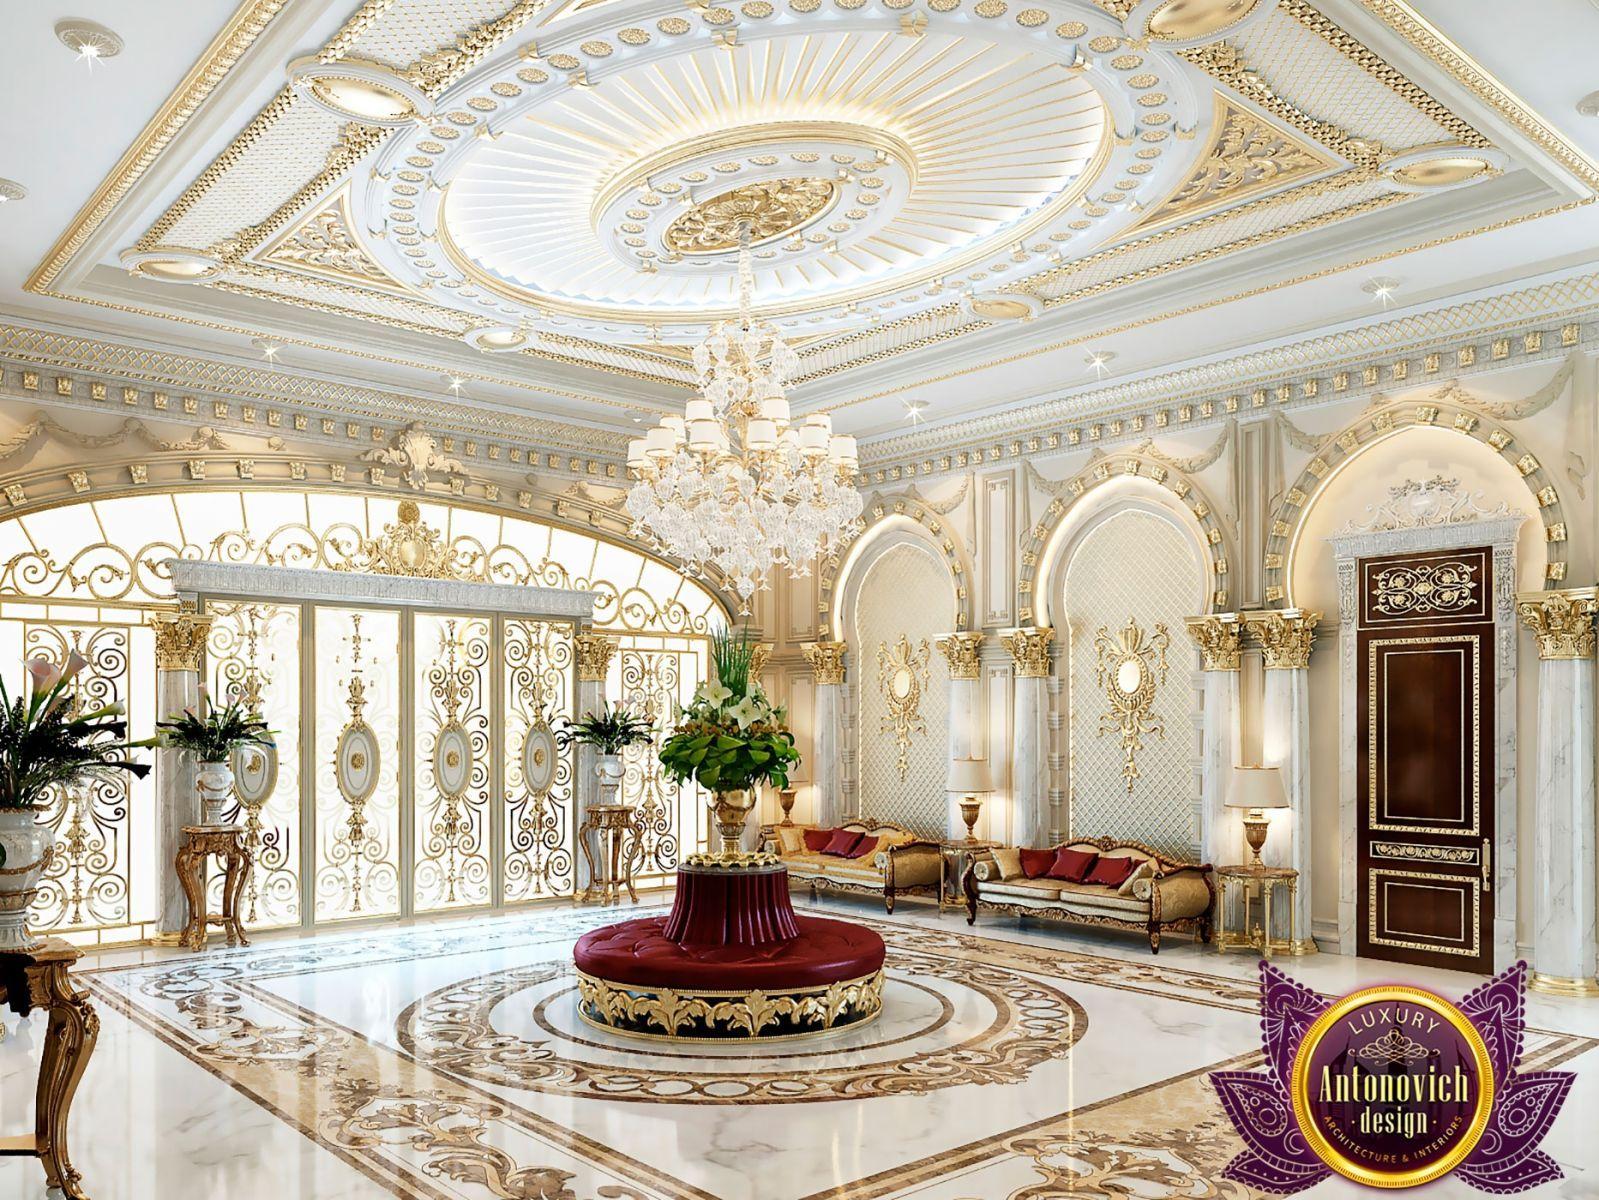 hanging chair kuwait club slipcovers white case di lusso a parigi foto 3440 myluxury livingroom